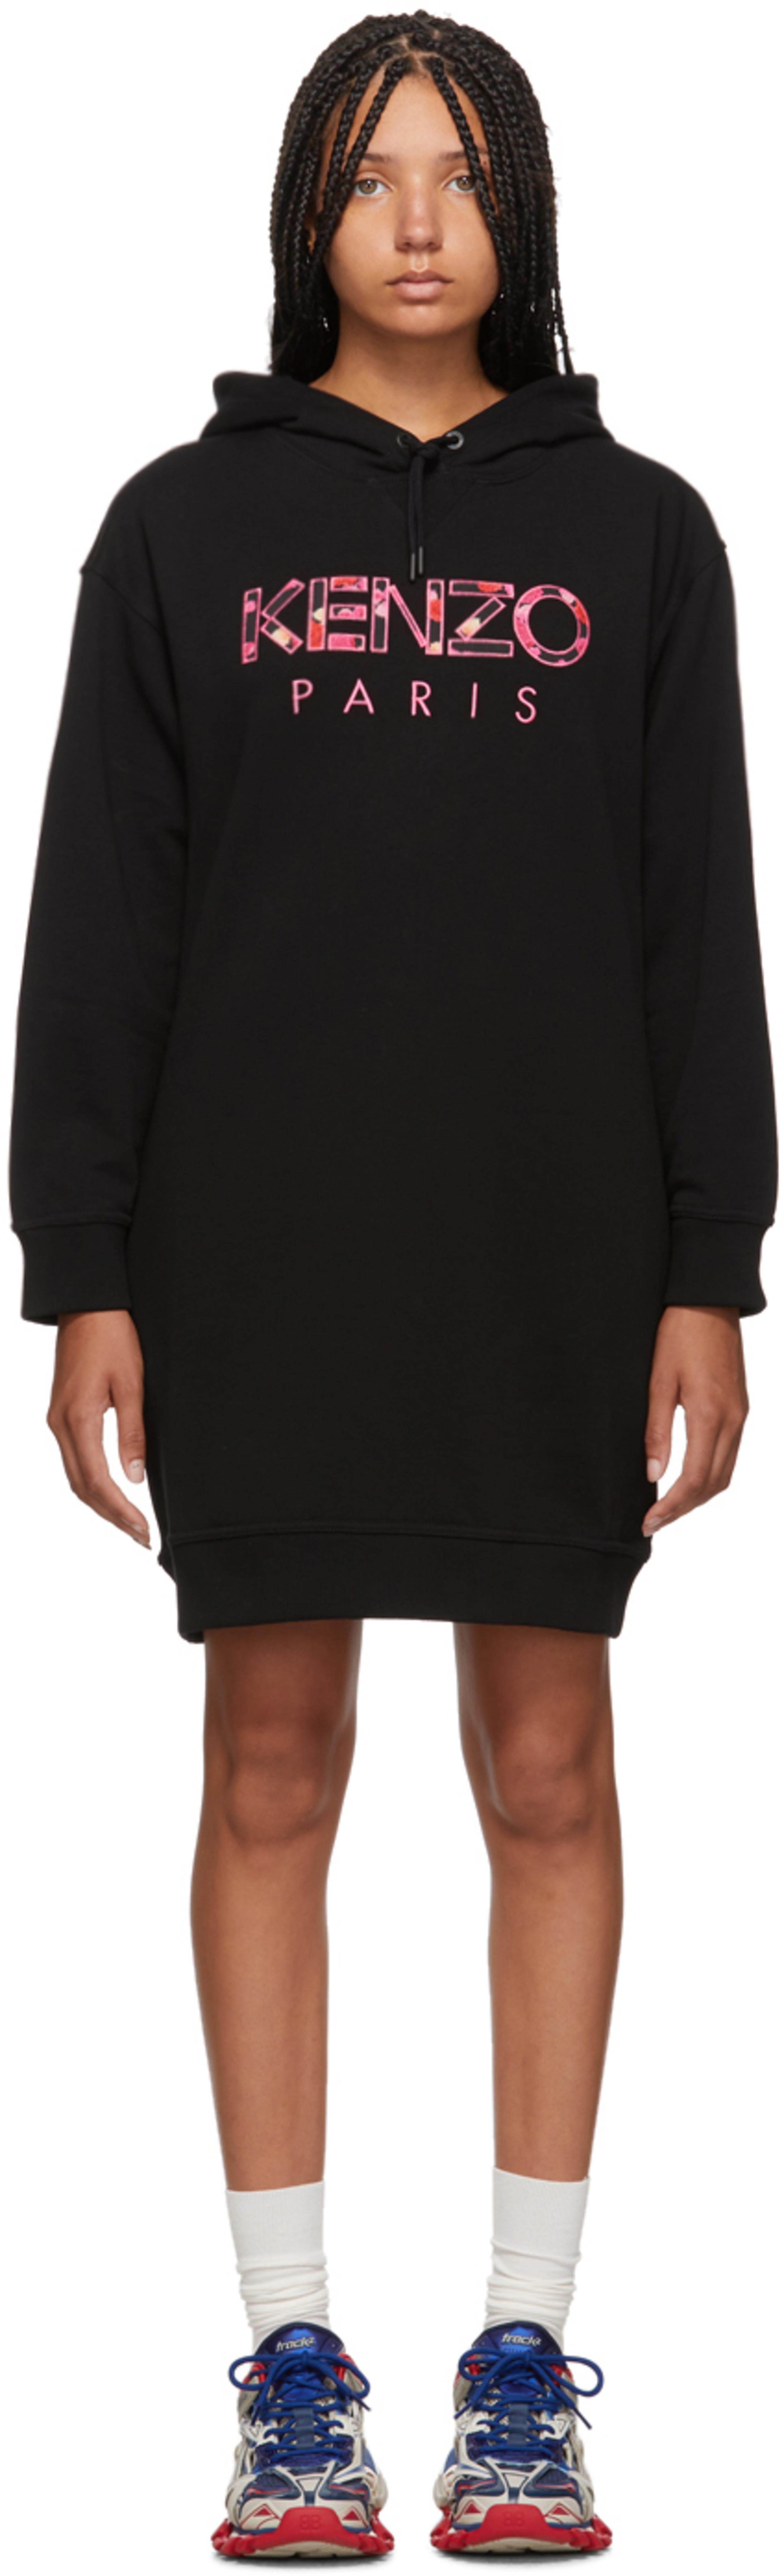 a52a7ef0f0 Black 'Kenzo Paris' Peony Sweatshirt Dress